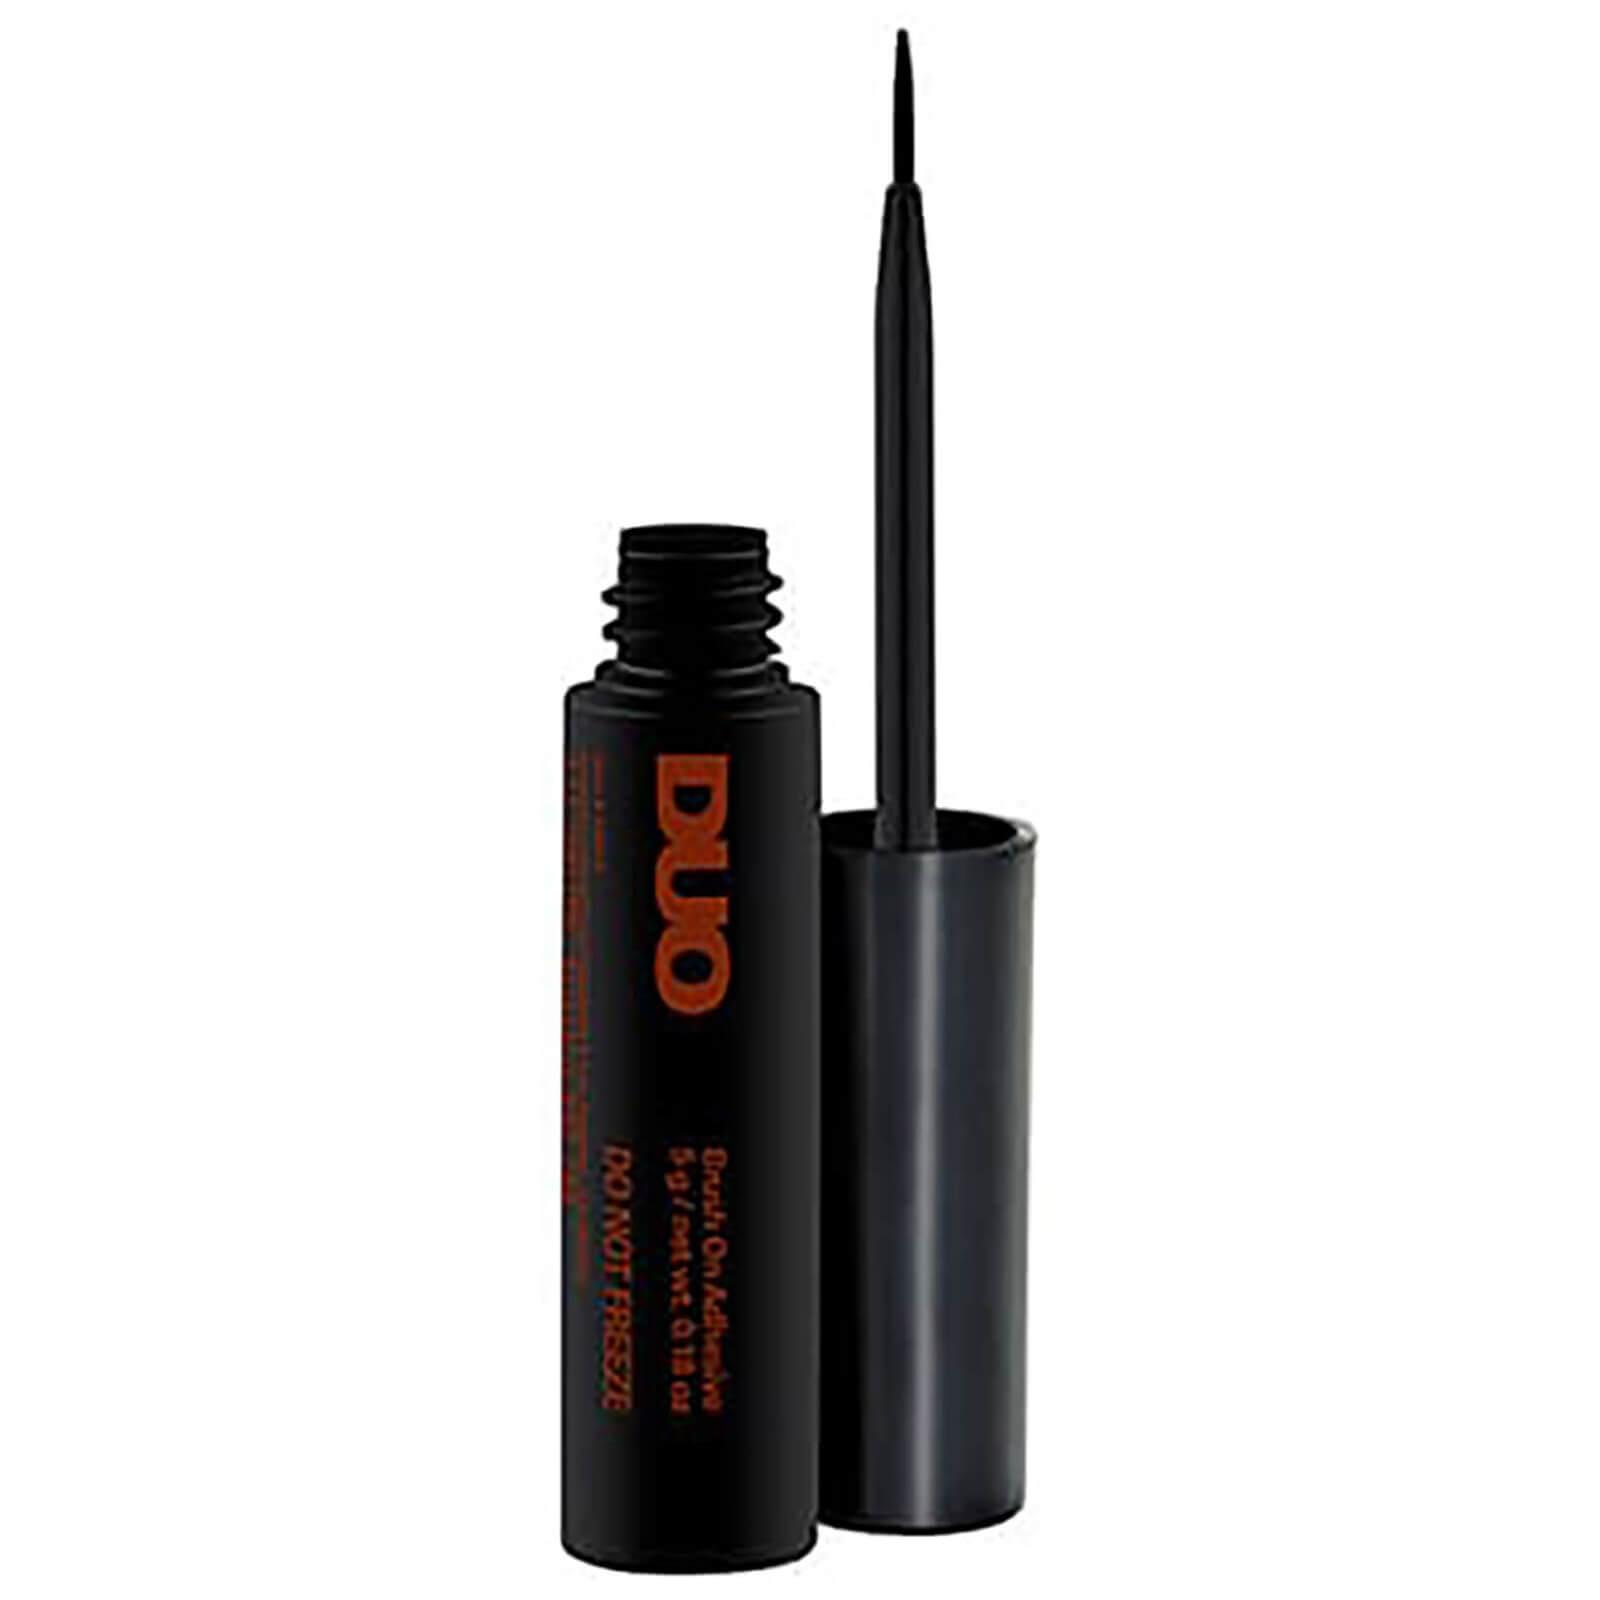 Купить Duo Brush On Striplash Adhesive - Black (5g)